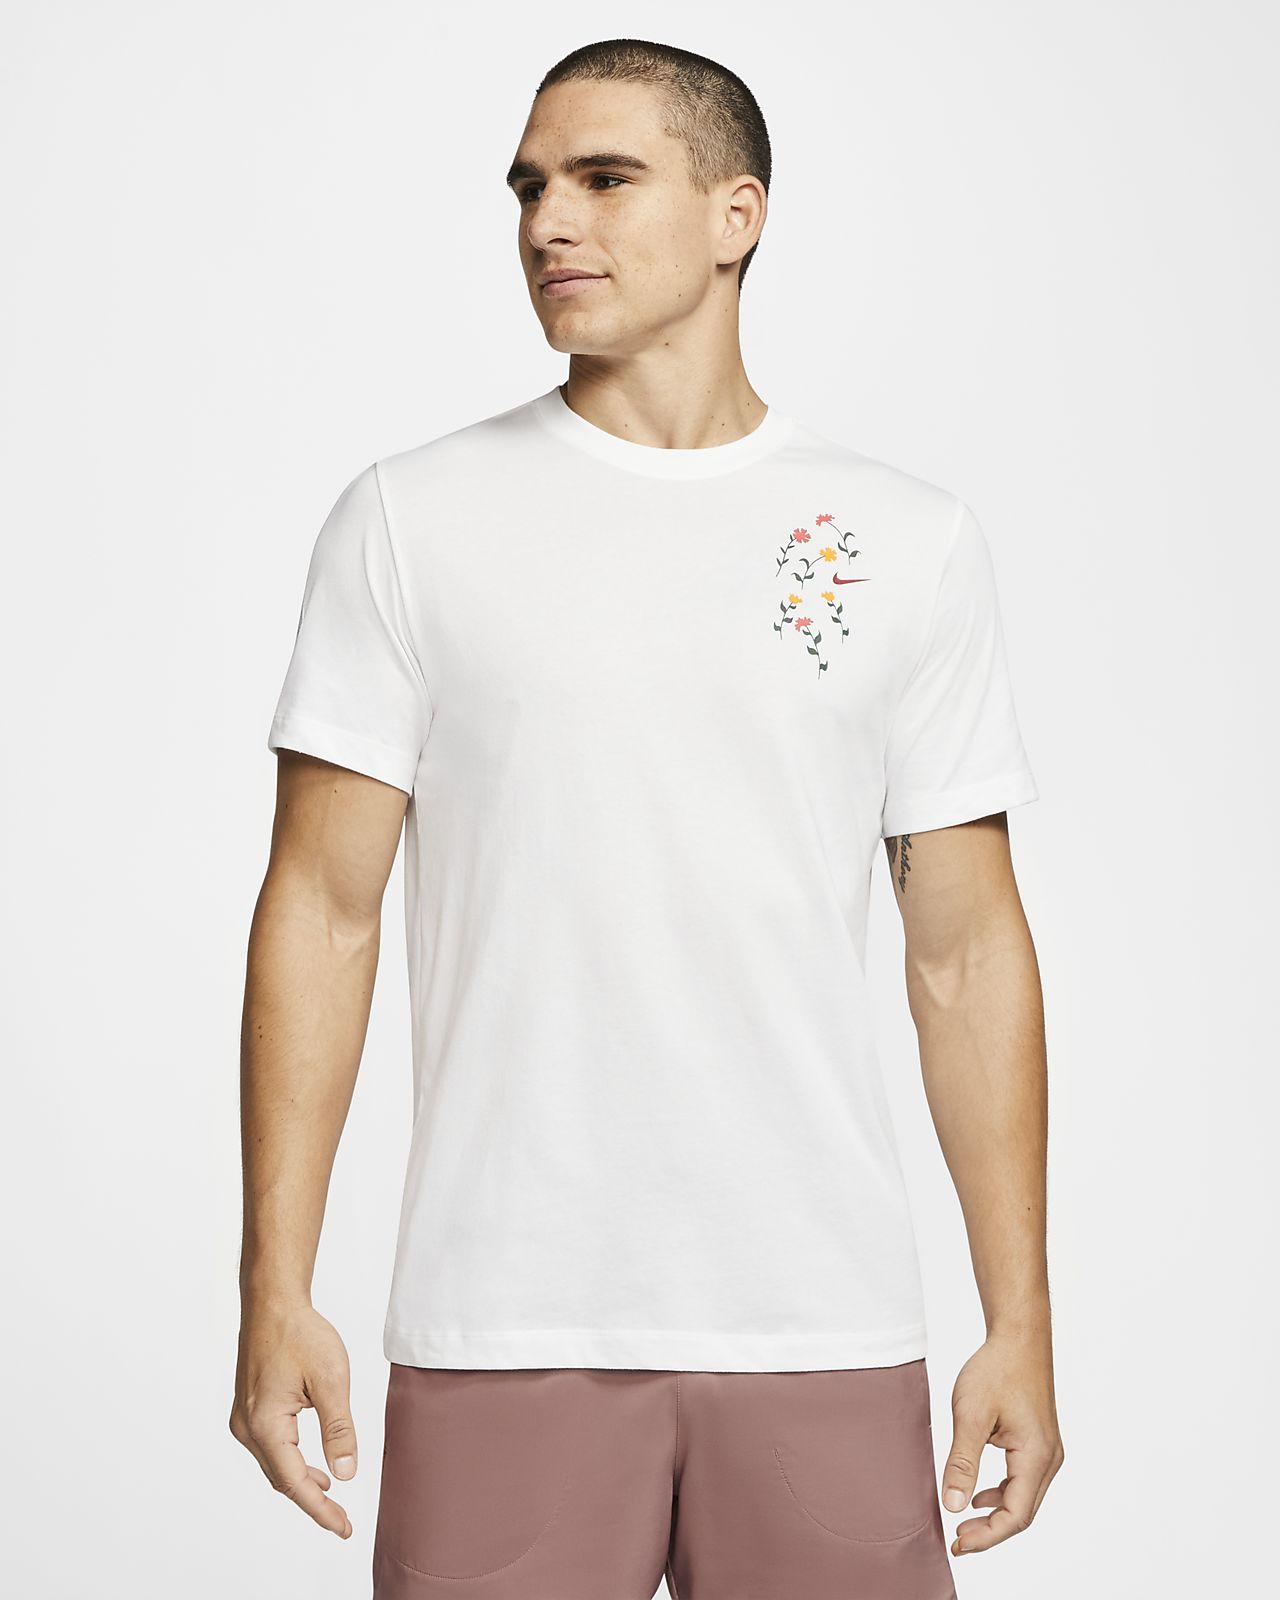 Tee-shirt à manches longues Nike Tee-shirt pour Homme